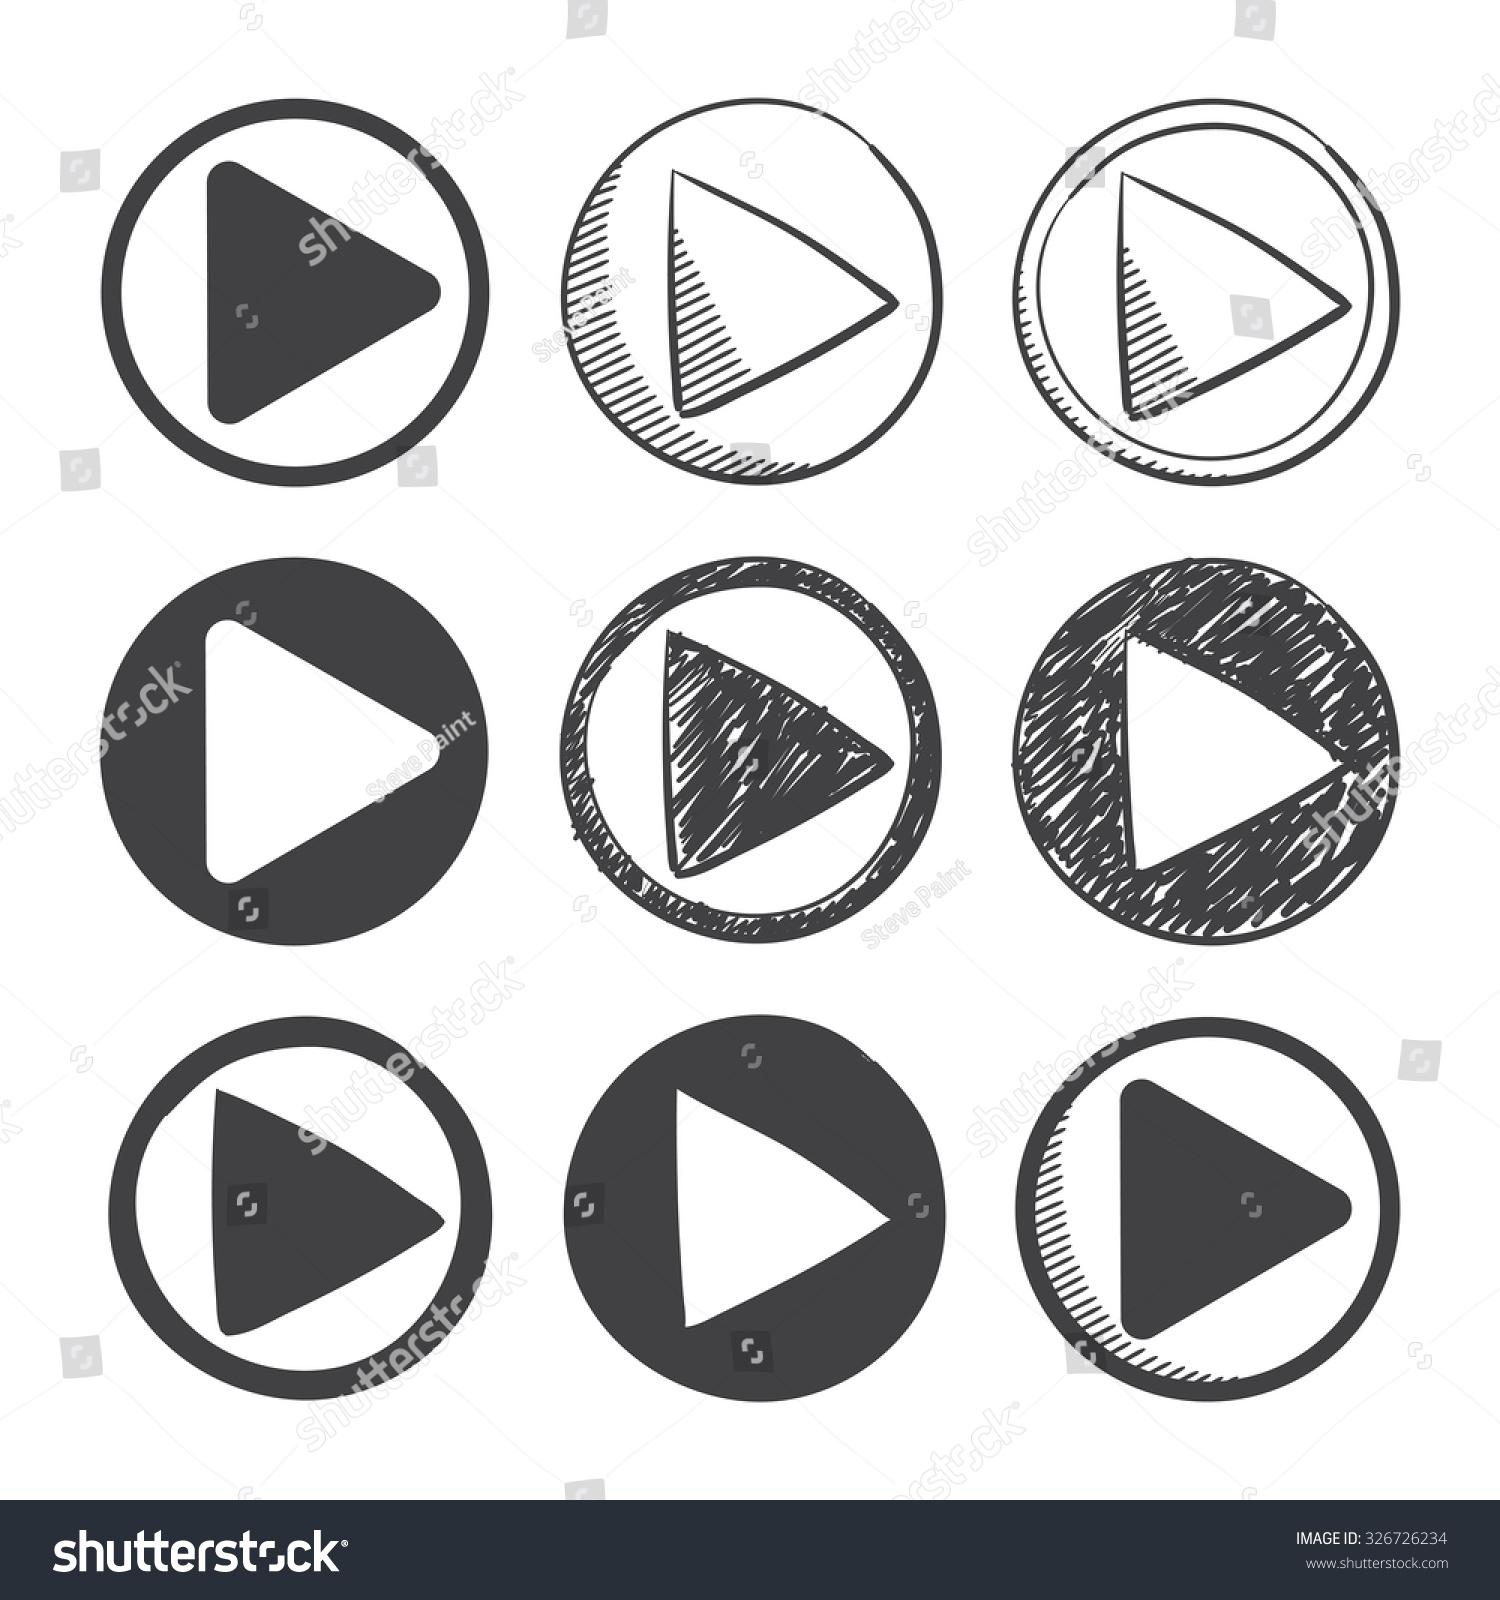 Nine Hand Drawn Material Design Play Stock Vector 326726234